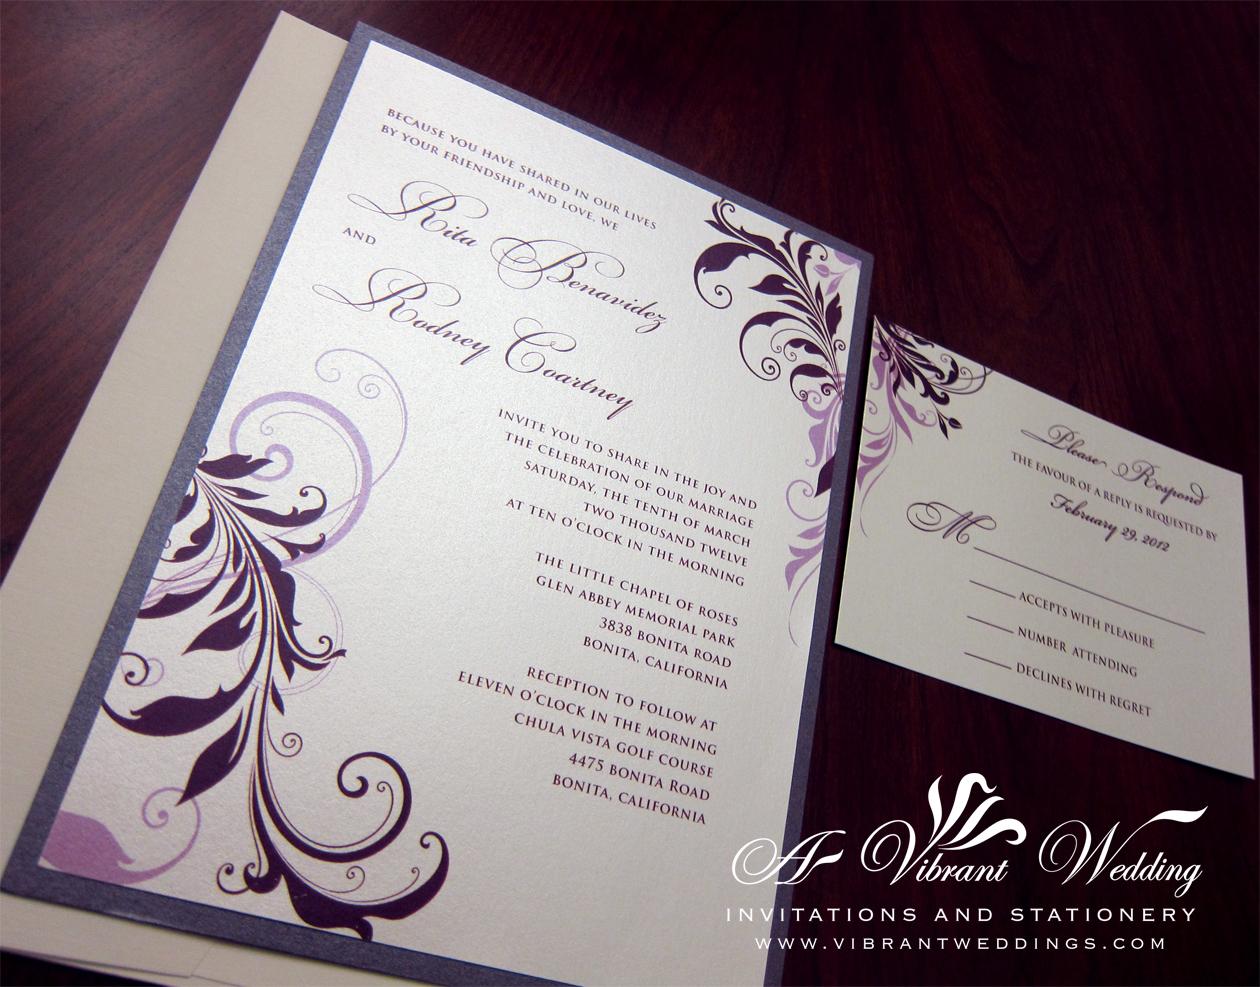 flat wedding invitation scroll wedding invitations Eggplant Purple Lavender Wedding Invitation Floral Scroll Design